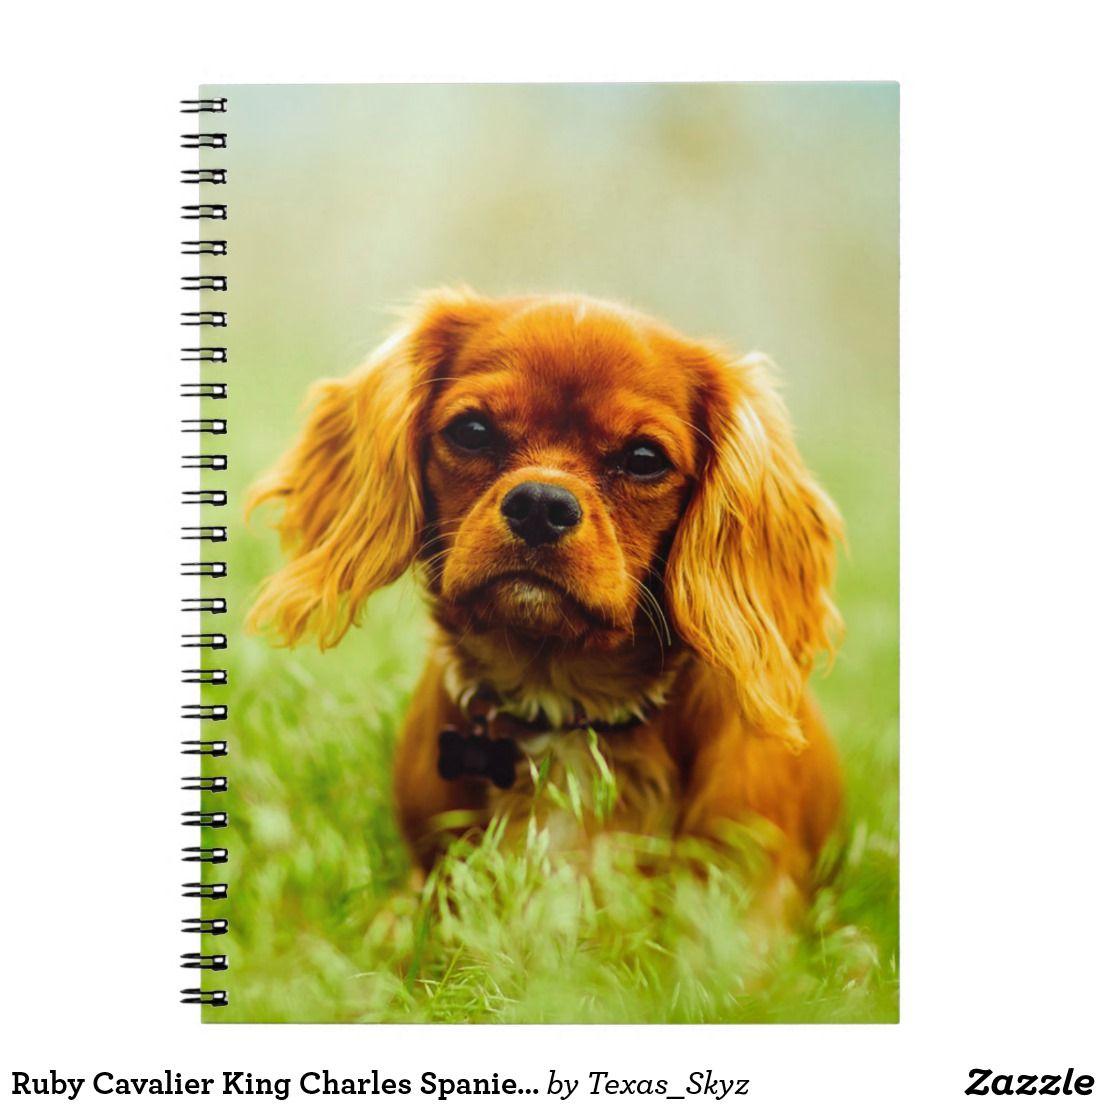 Ruby Cavalier King Charles Spaniel Puppy Dog Notebook Zazzle Com In 2020 King Charles Cavalier Spaniel Puppy Ruby Cavalier King Charles Spaniel Puppy Cavalier King Charles Spaniel